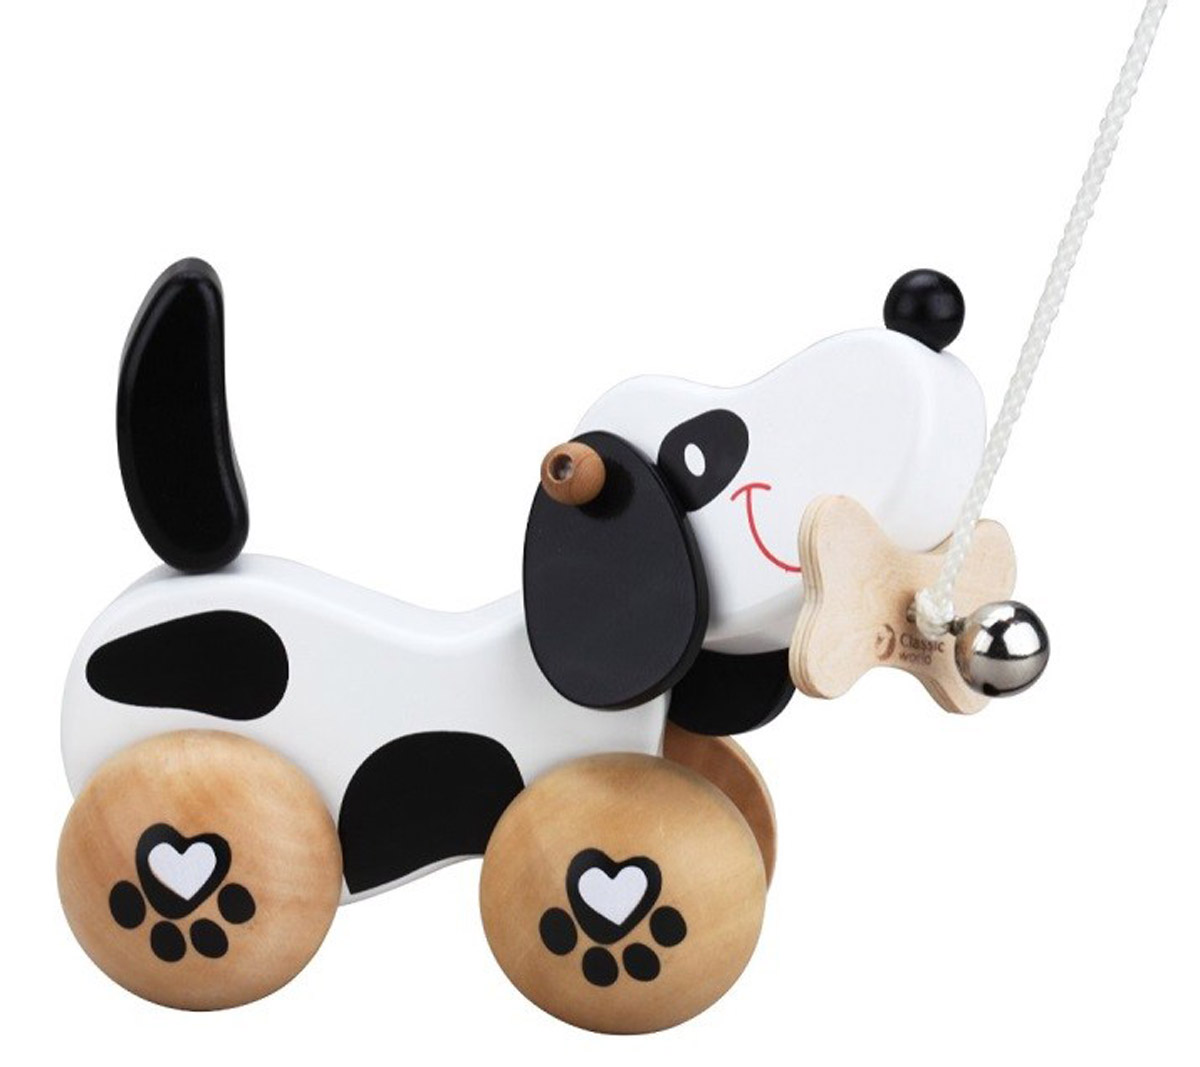 Classic World Игрушка-каталка Щенок большую мягкую игрушку собаку лежа в москве